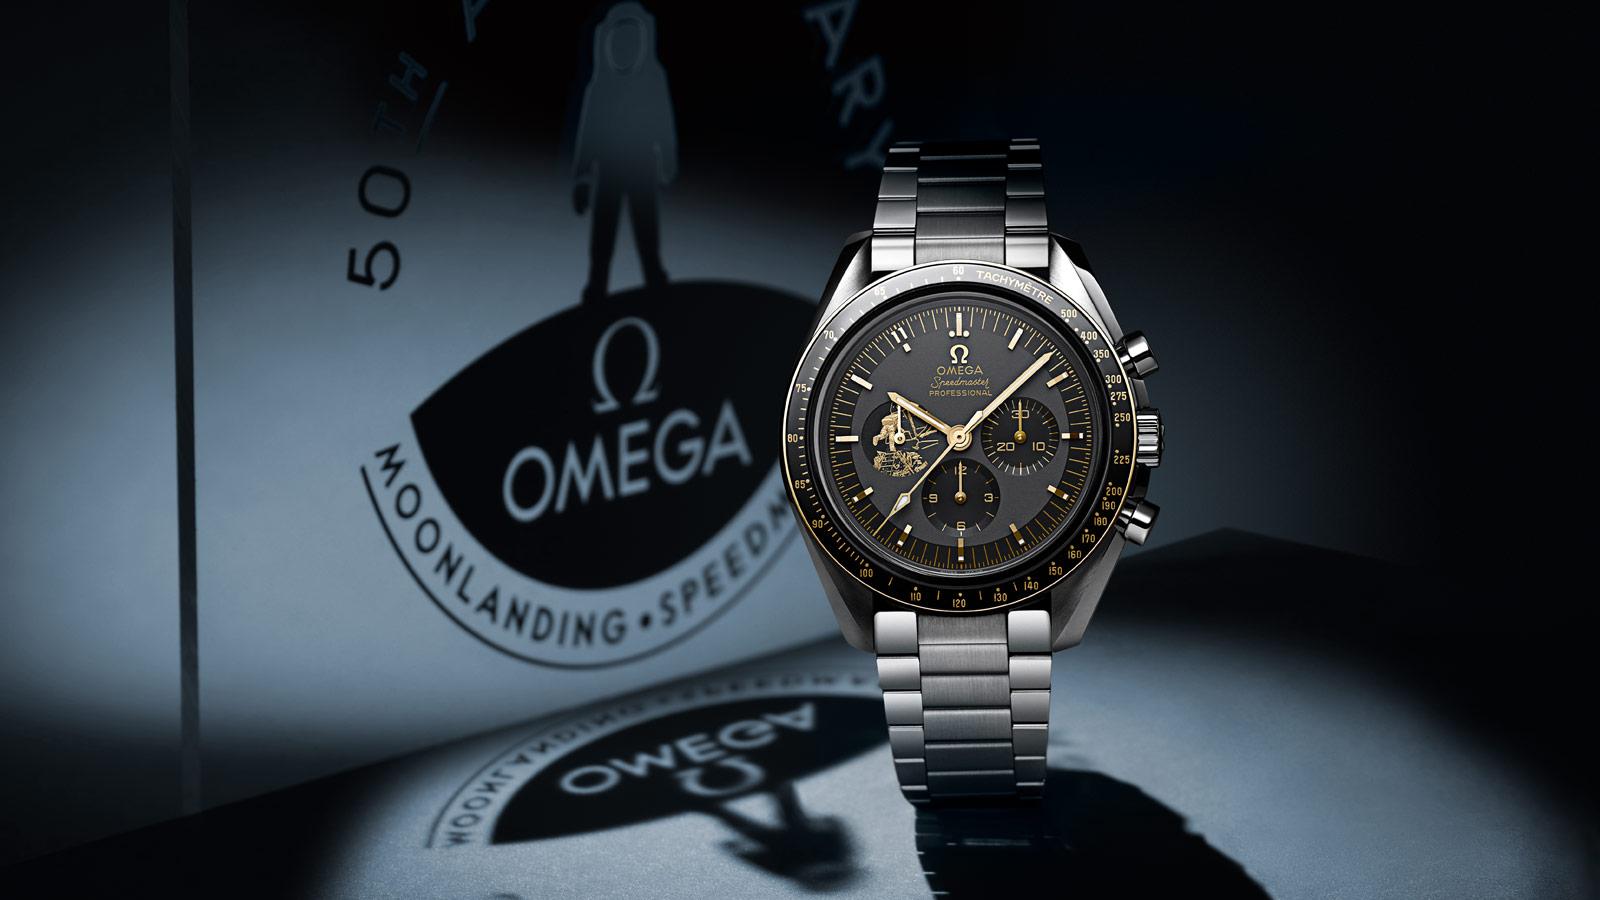 Omega Speedmaster Apollo 11 50th Anniversary LE  Photo Credit: Omega